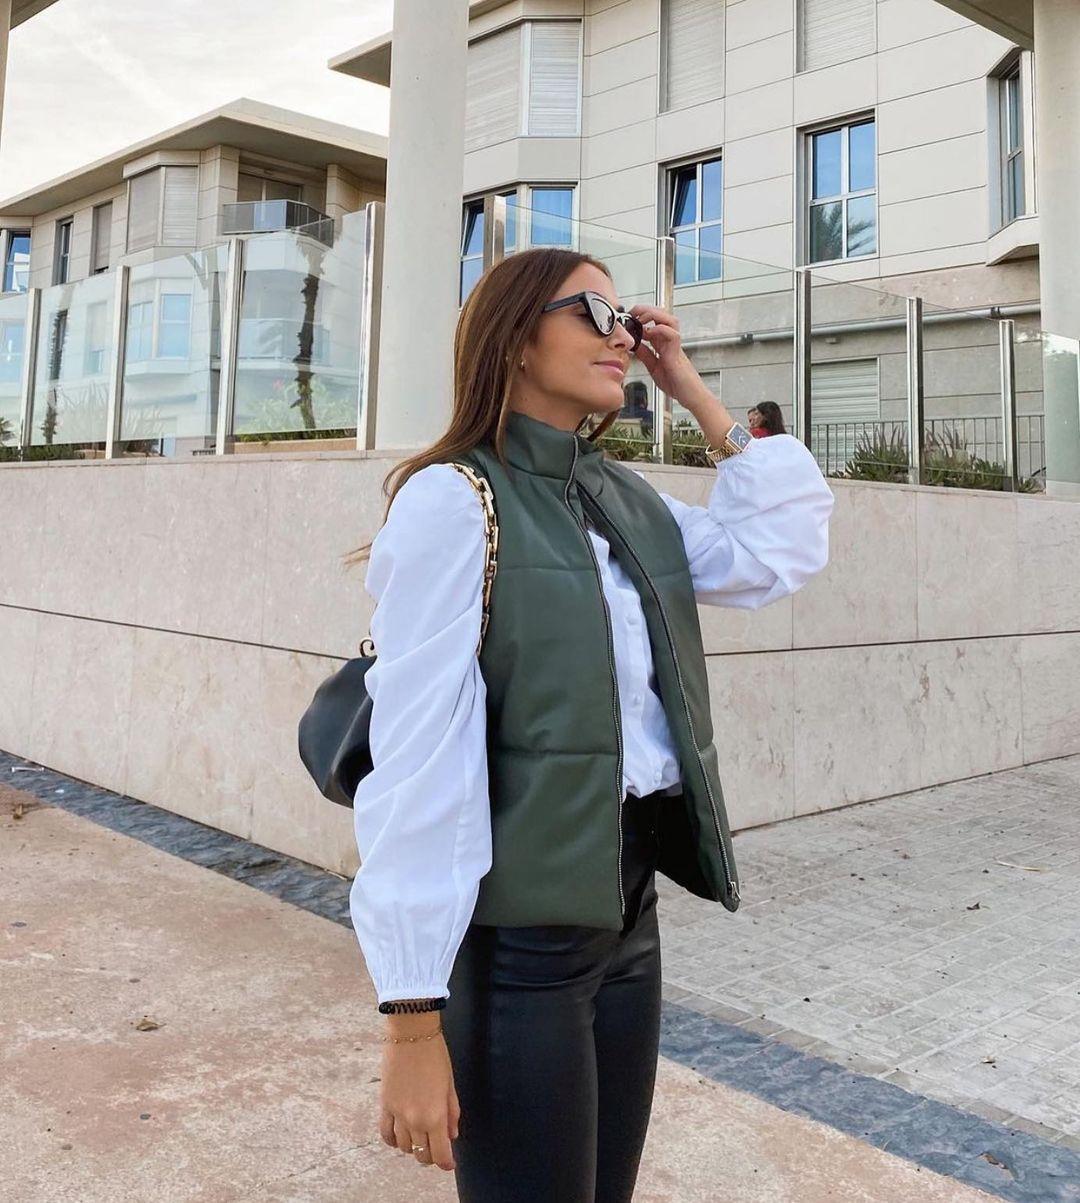 doudoune sans manches matelassée effet cuir de Zara sur zara.outfits